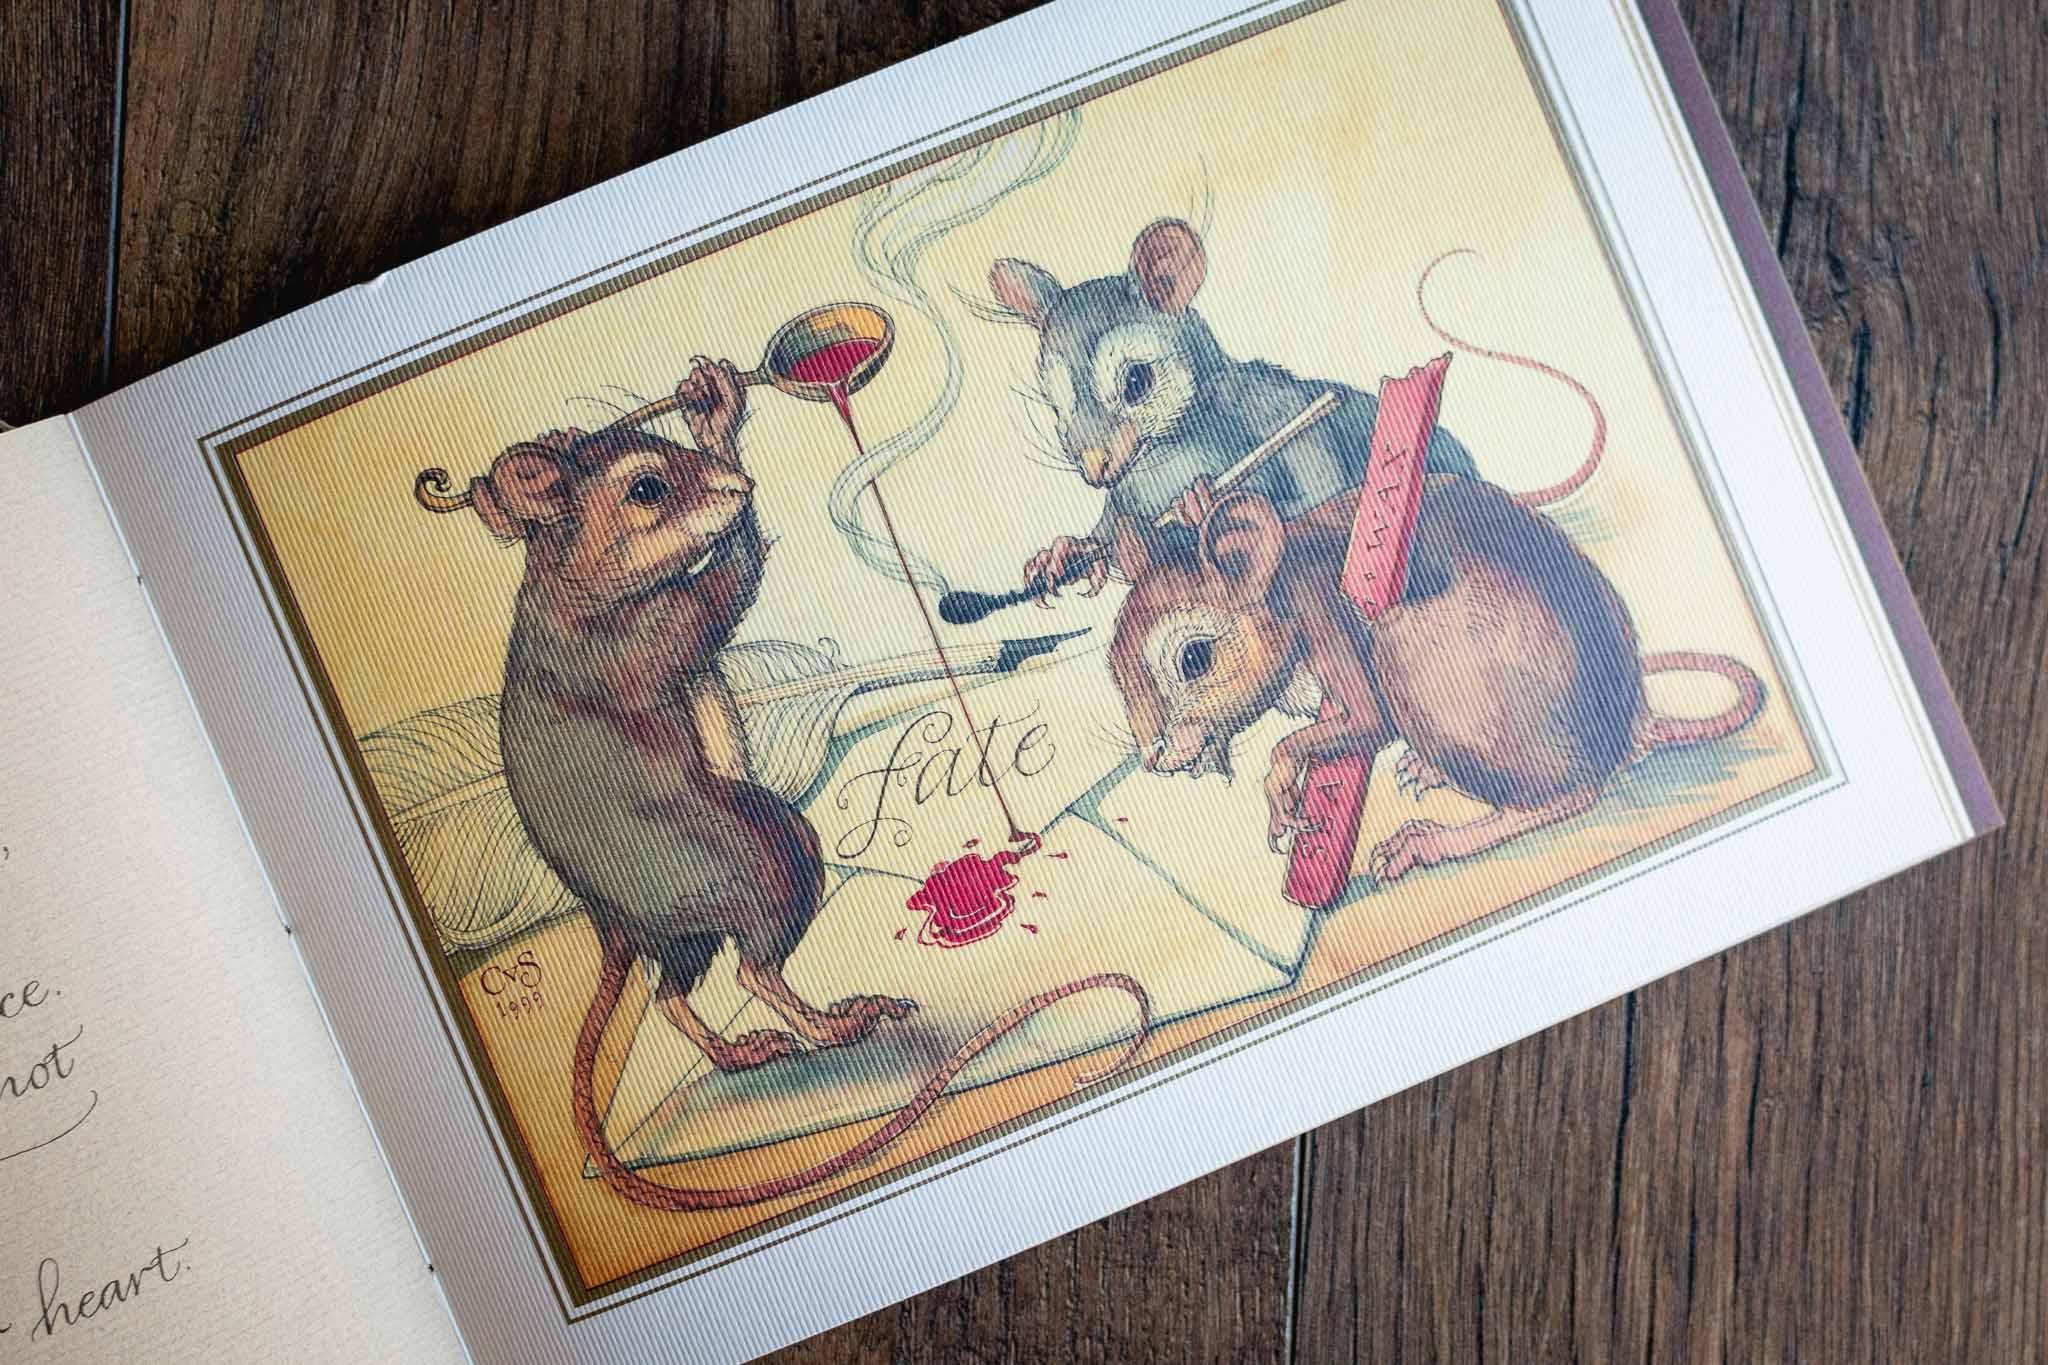 Animal Wisdom Fine Art Book by Charles Van Sandwyk